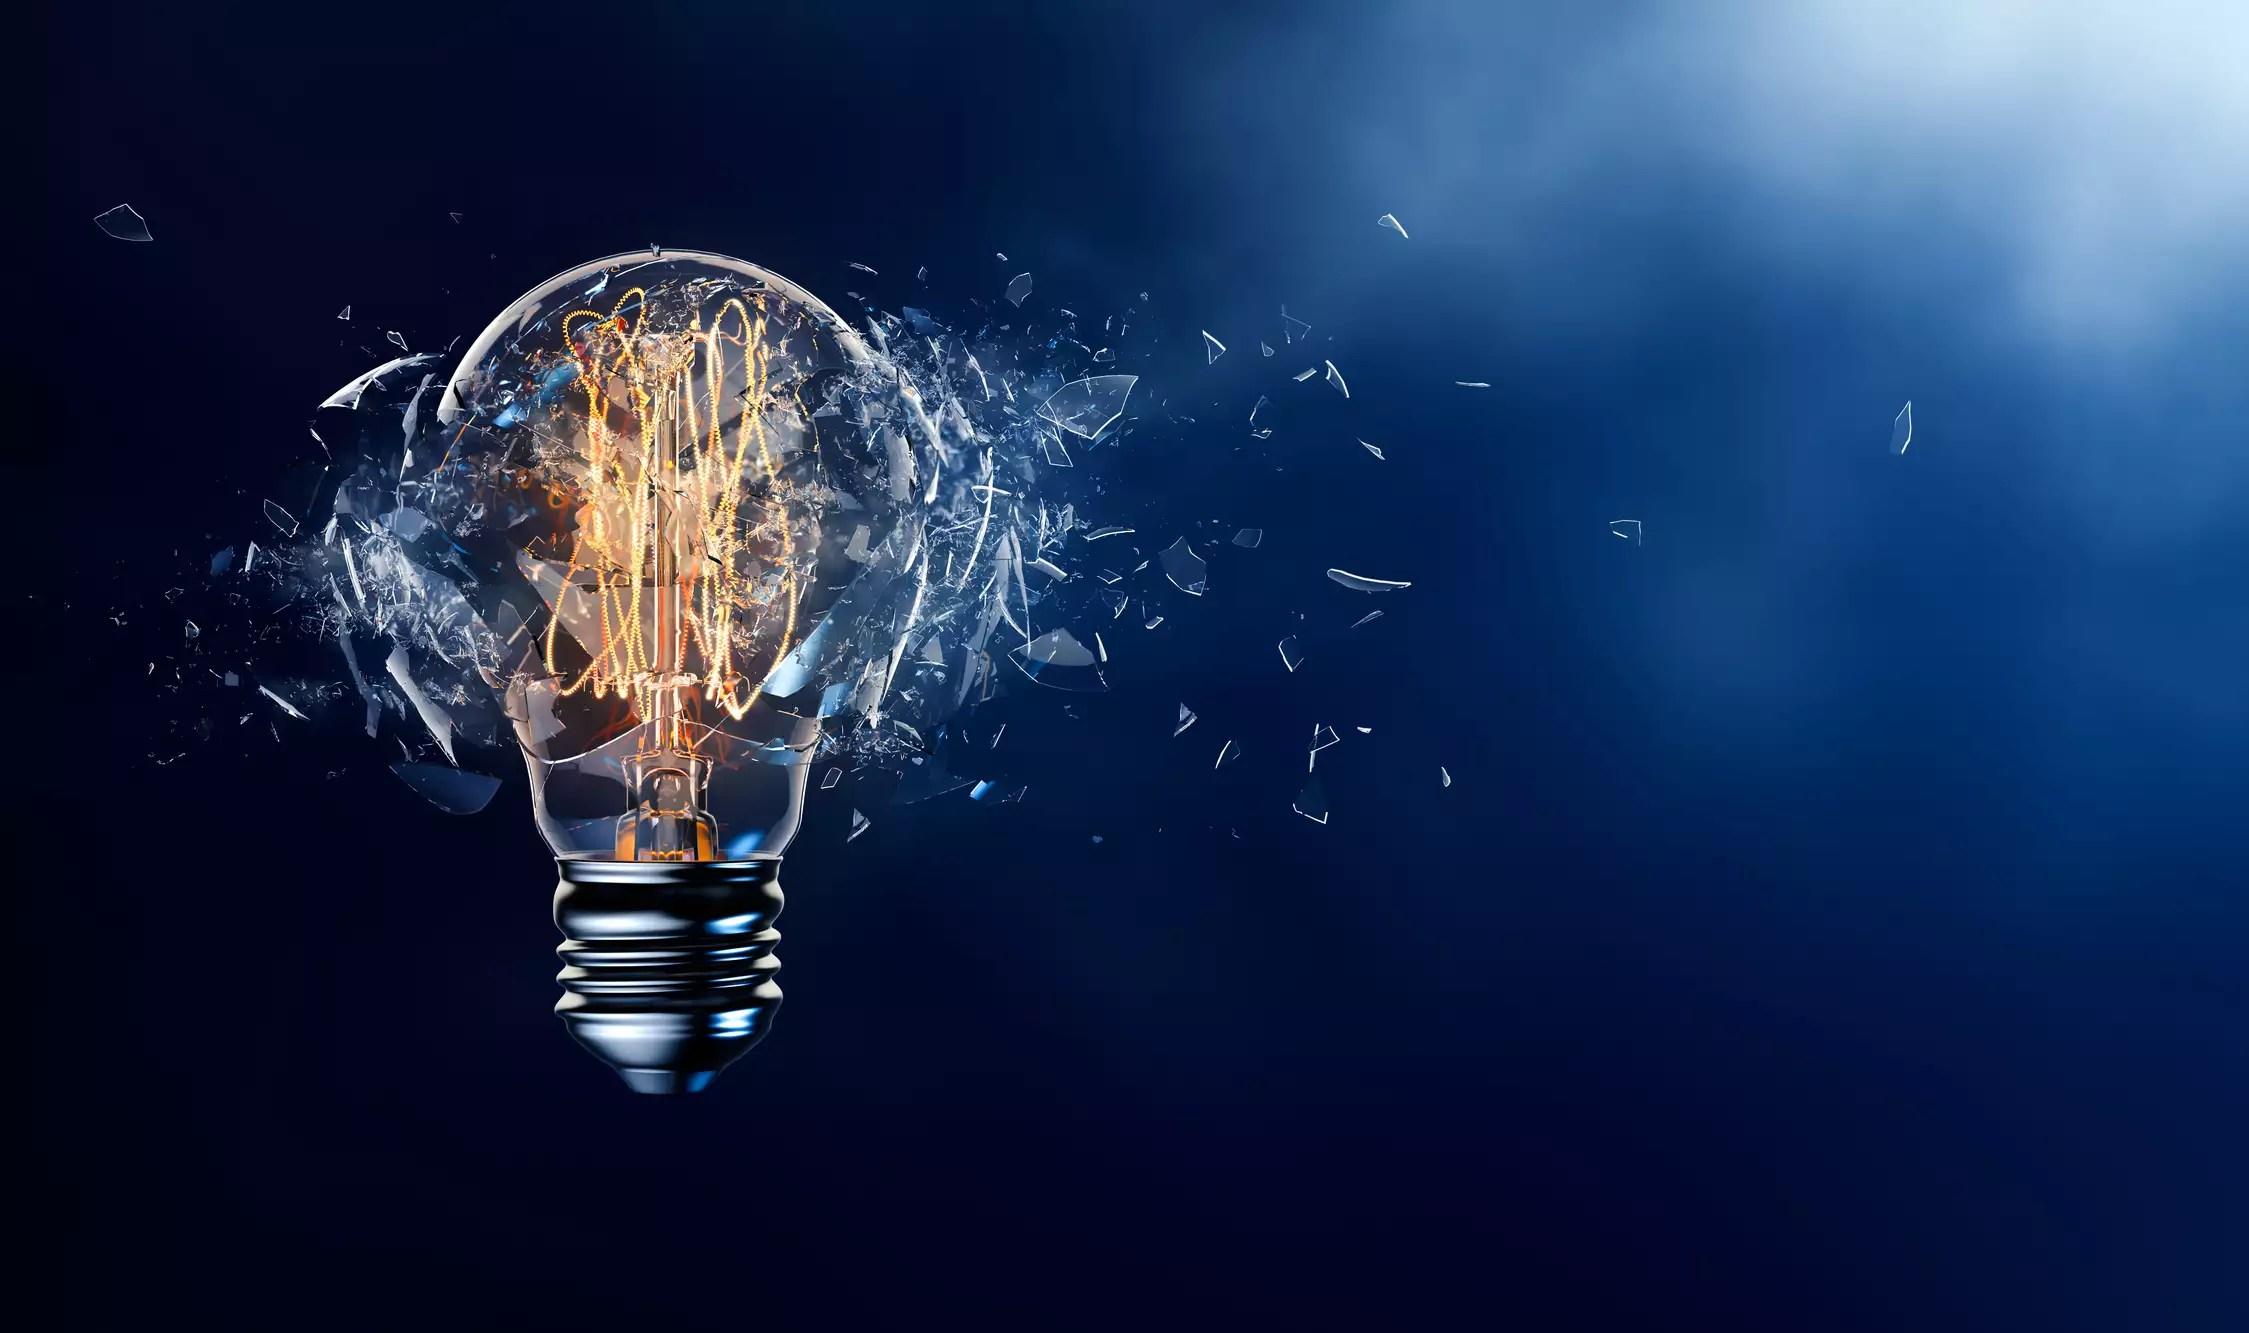 innovation novel device creates